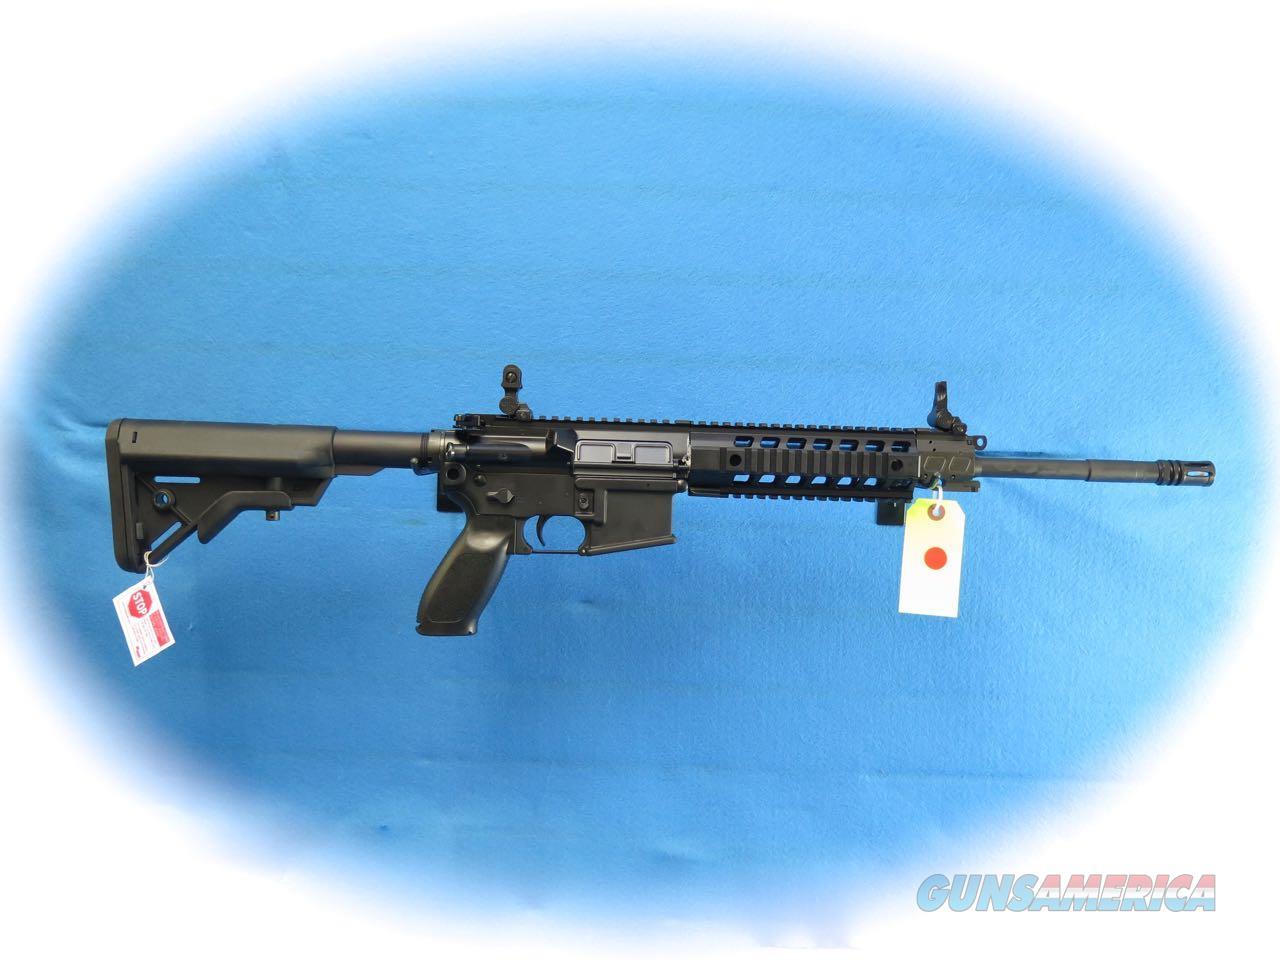 Sig Sauer SIG516 Patrol 5.56mm  Semi Auto Rifle  Model R516G2-16B-P **New**  Guns > Rifles > Sig - Sauer/Sigarms Rifles